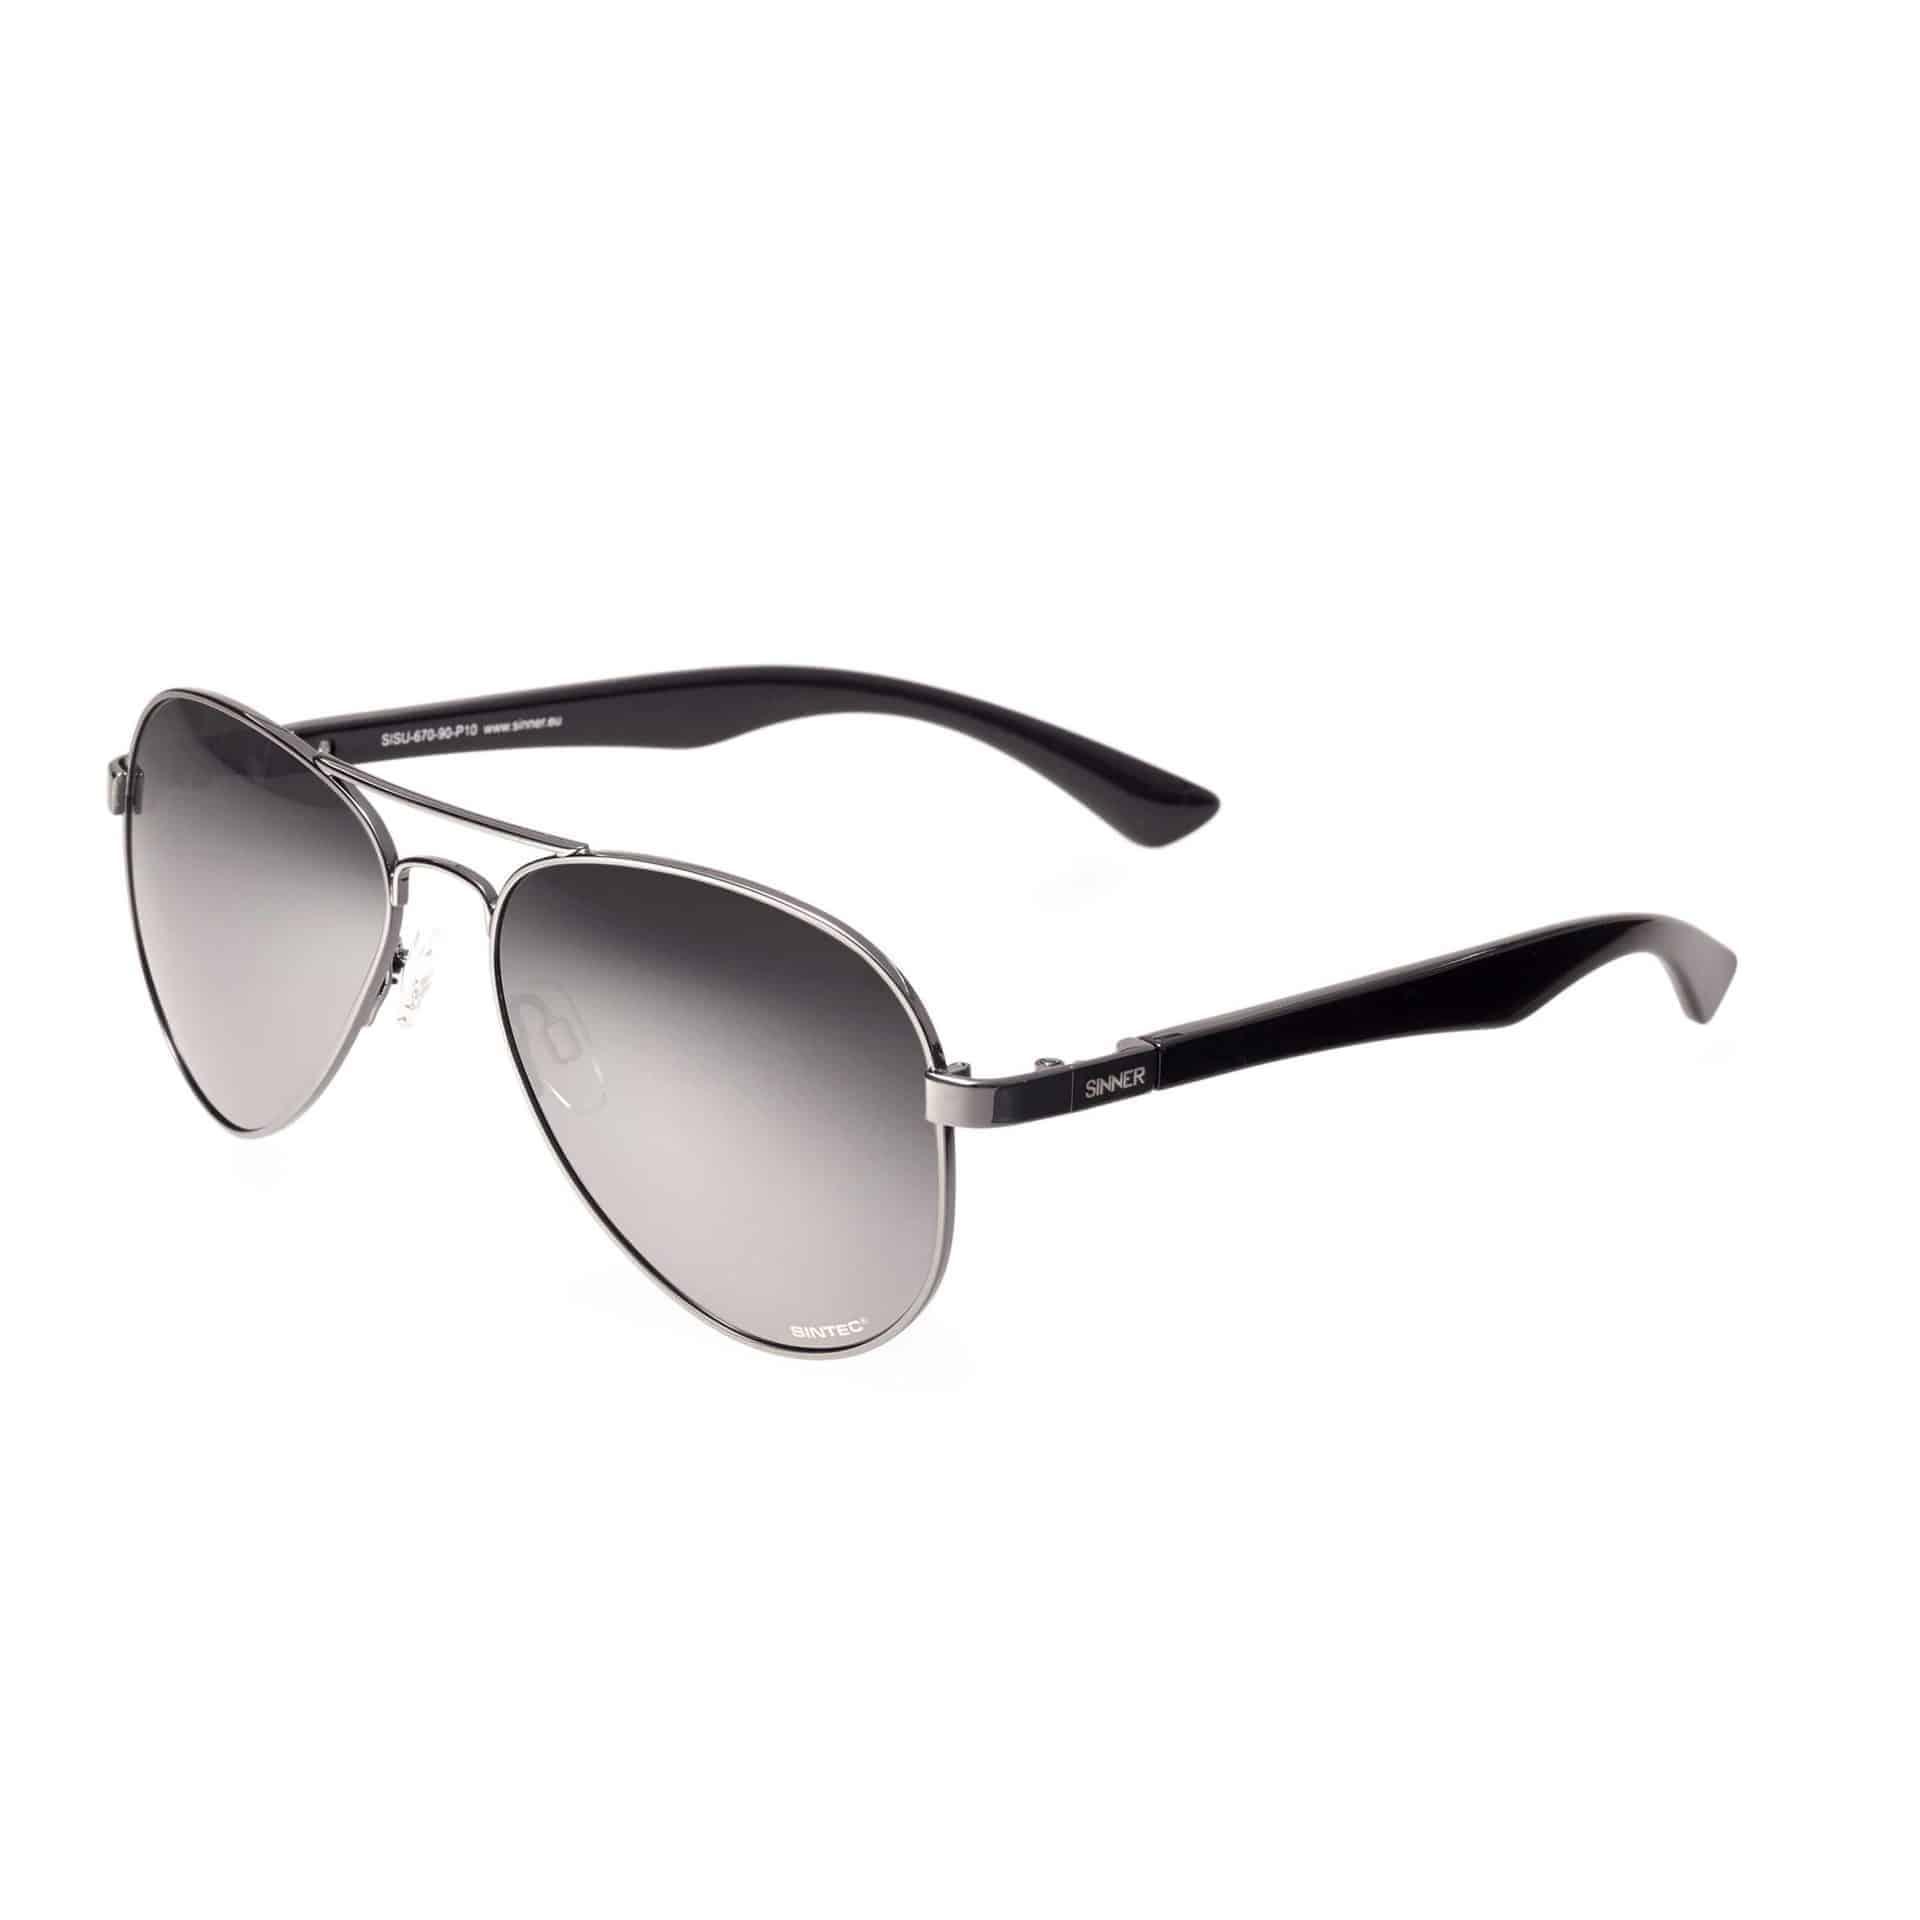 Sunglasses Summer Sinner Morin Black